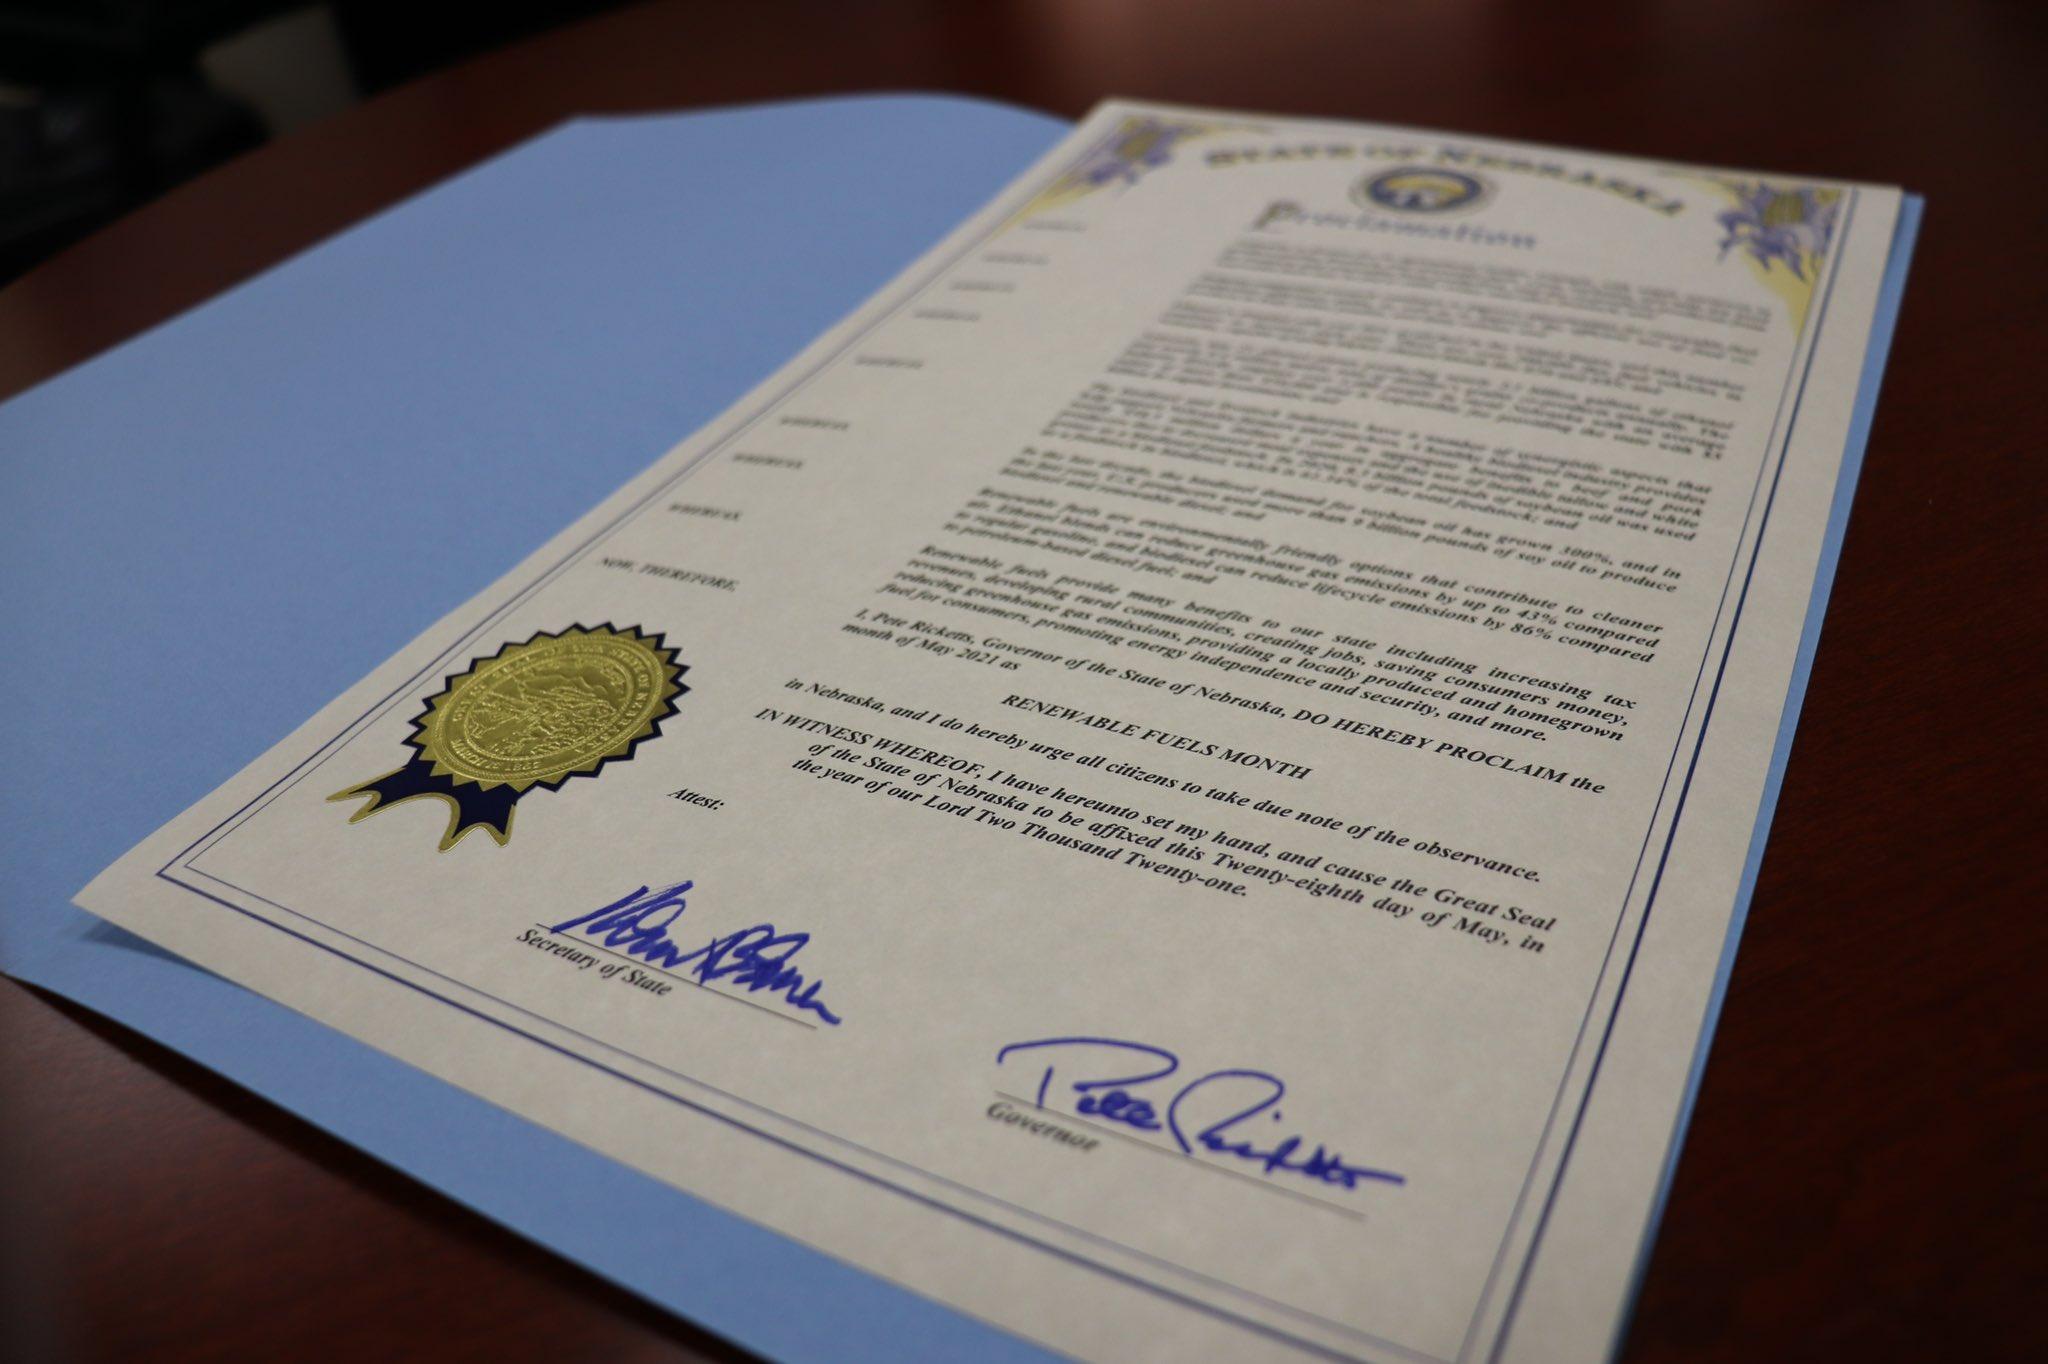 Gov. Ricketts proclaimed May, Renewable Fuels Month in Nebraska